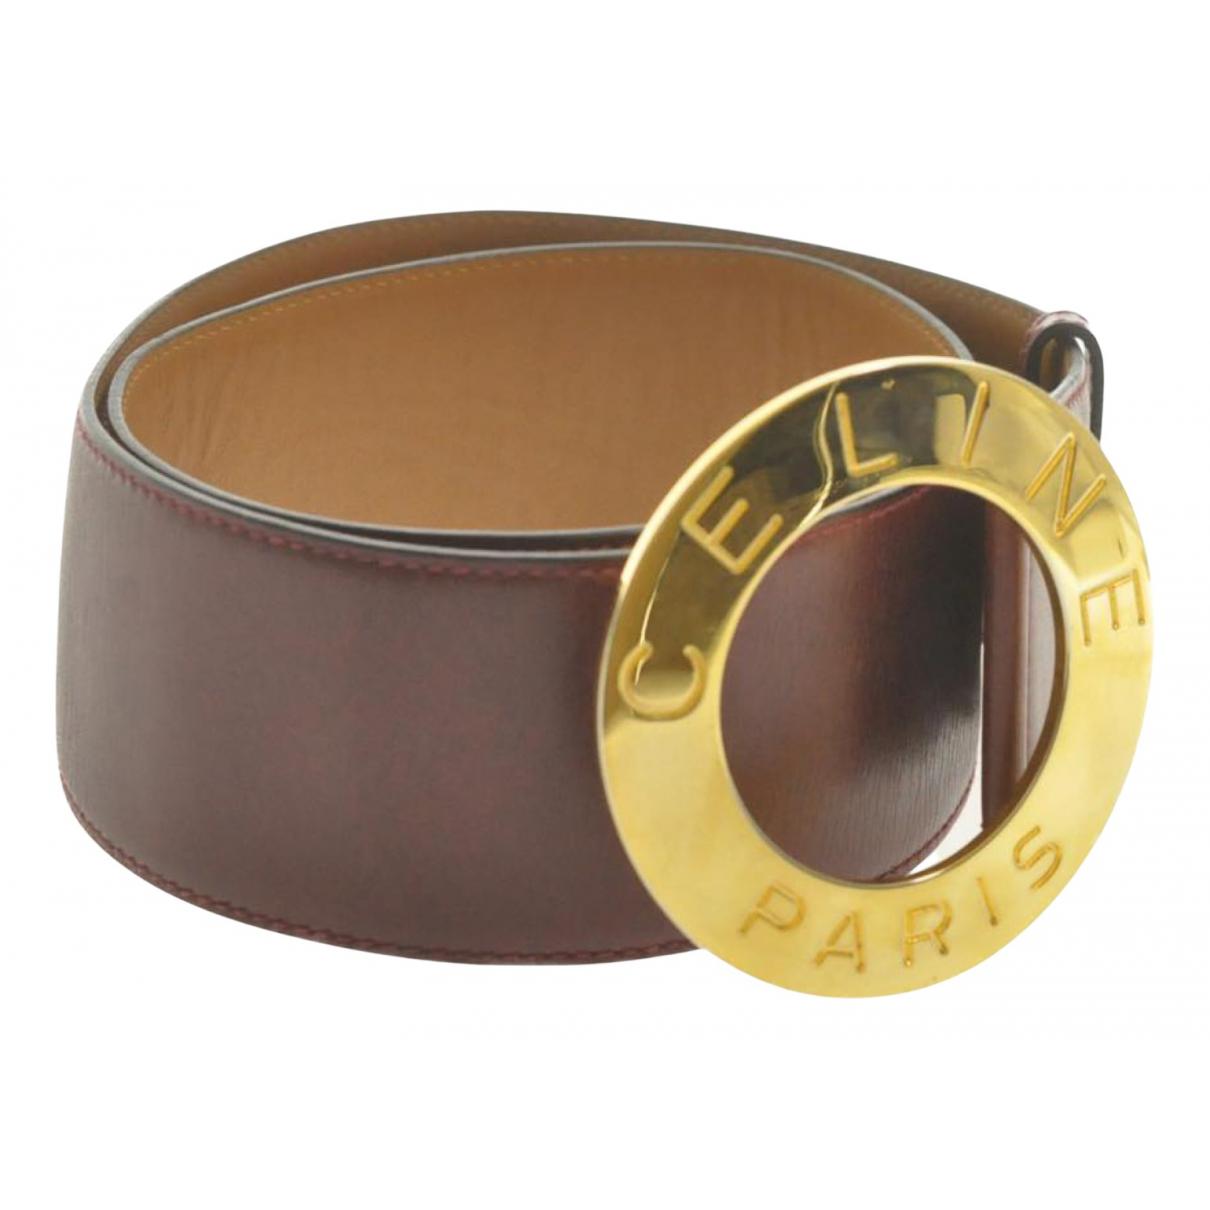 Celine N Brown Leather belt for Women 75 cm